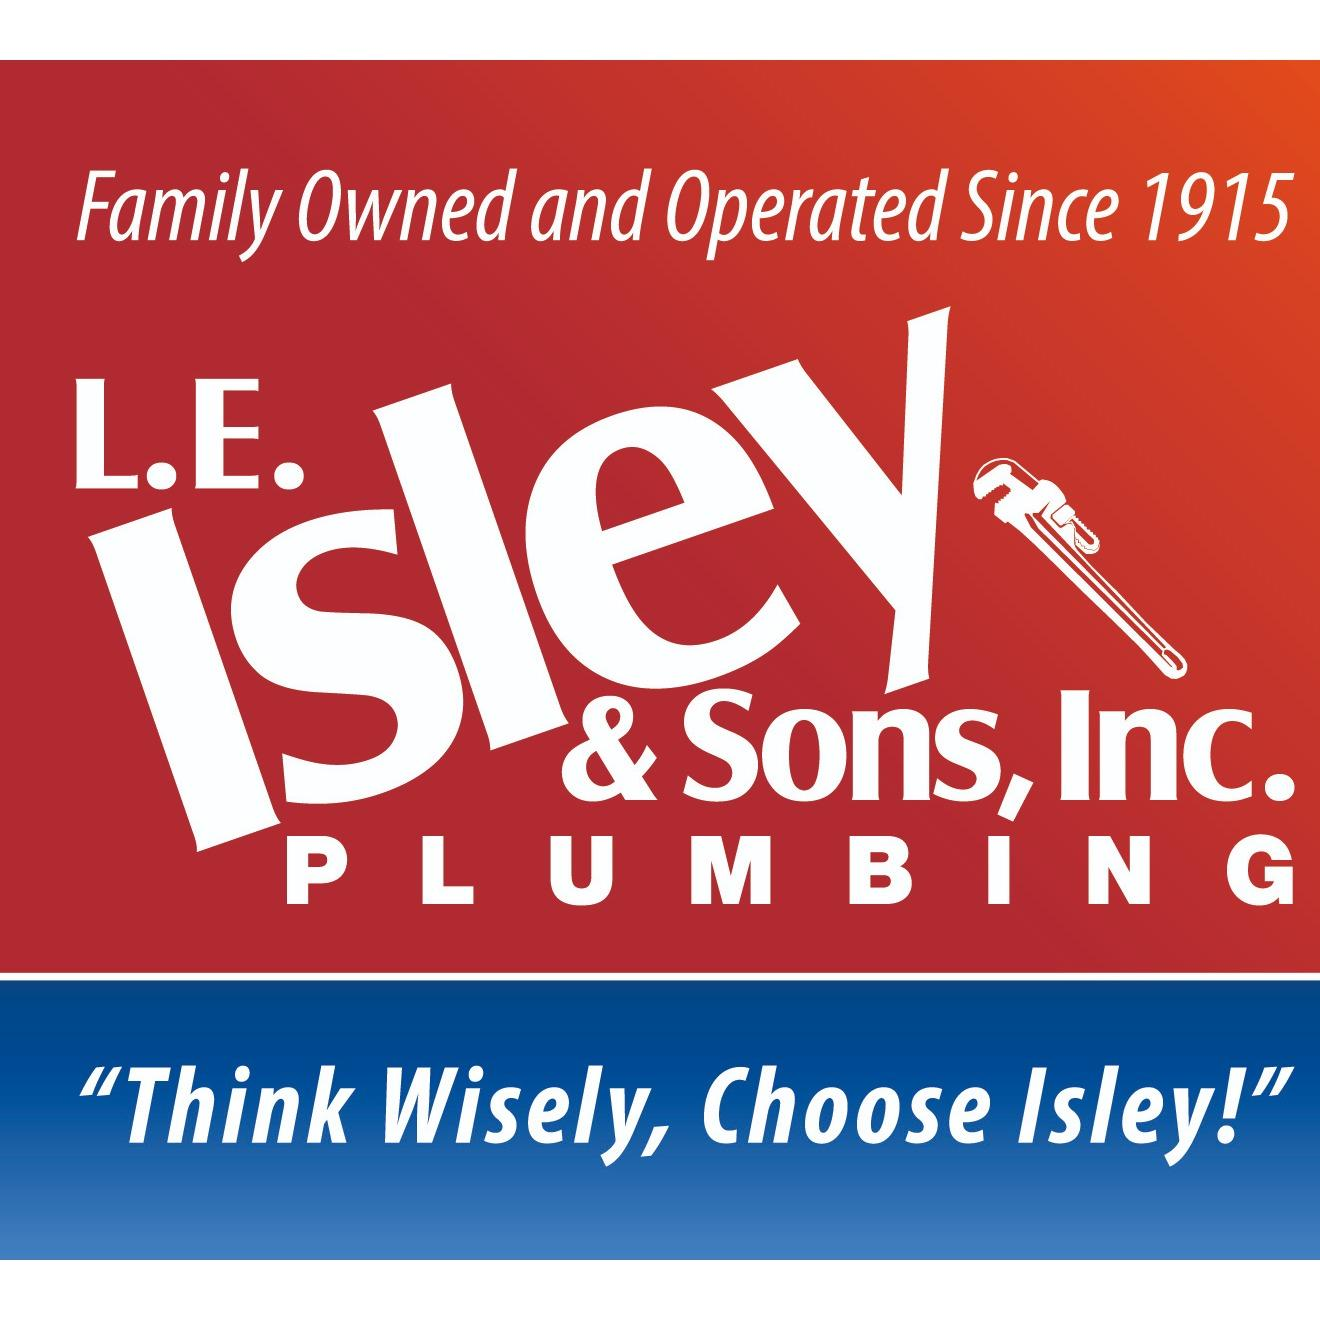 L.E. Isley & Sons, Inc.